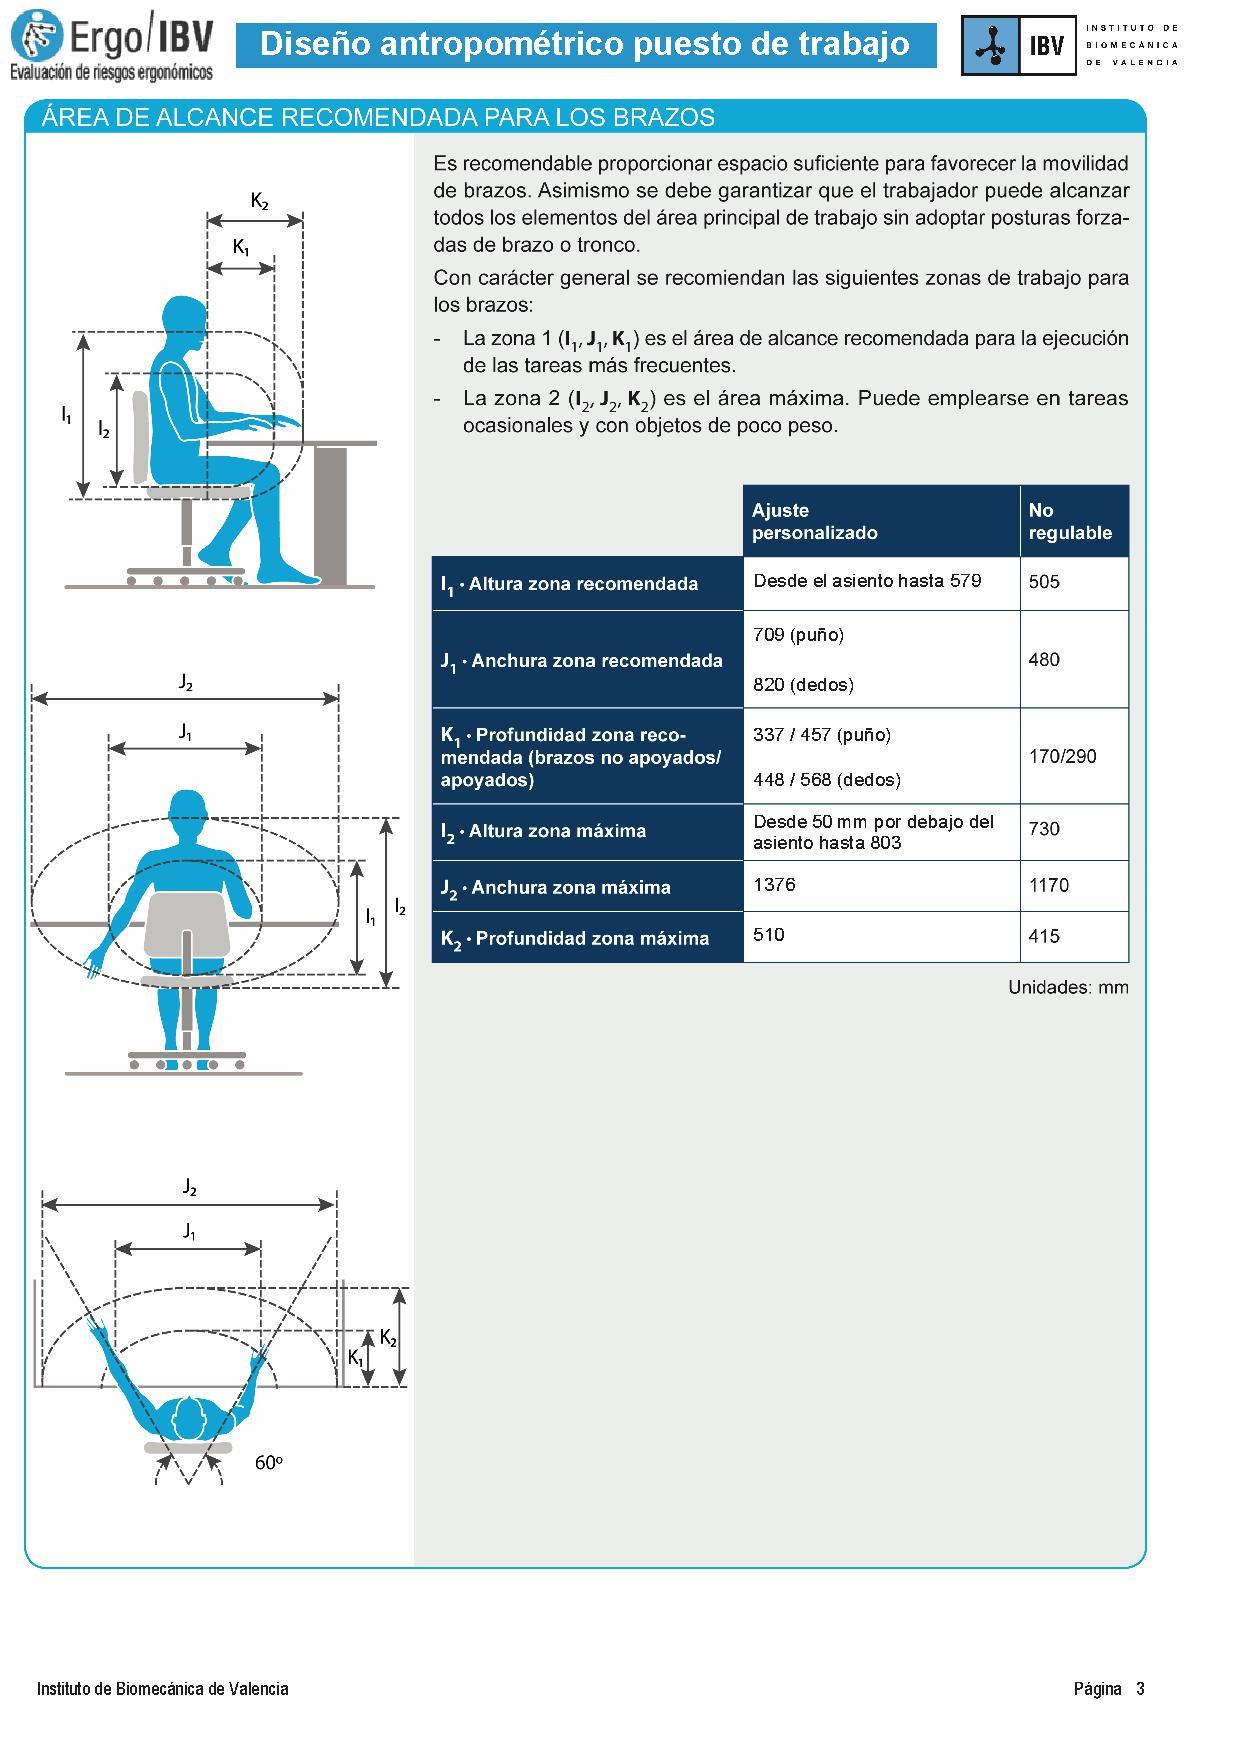 Instituto de Biomecánica - Ergo/IBV - Software Evaluación de Riesgos ...